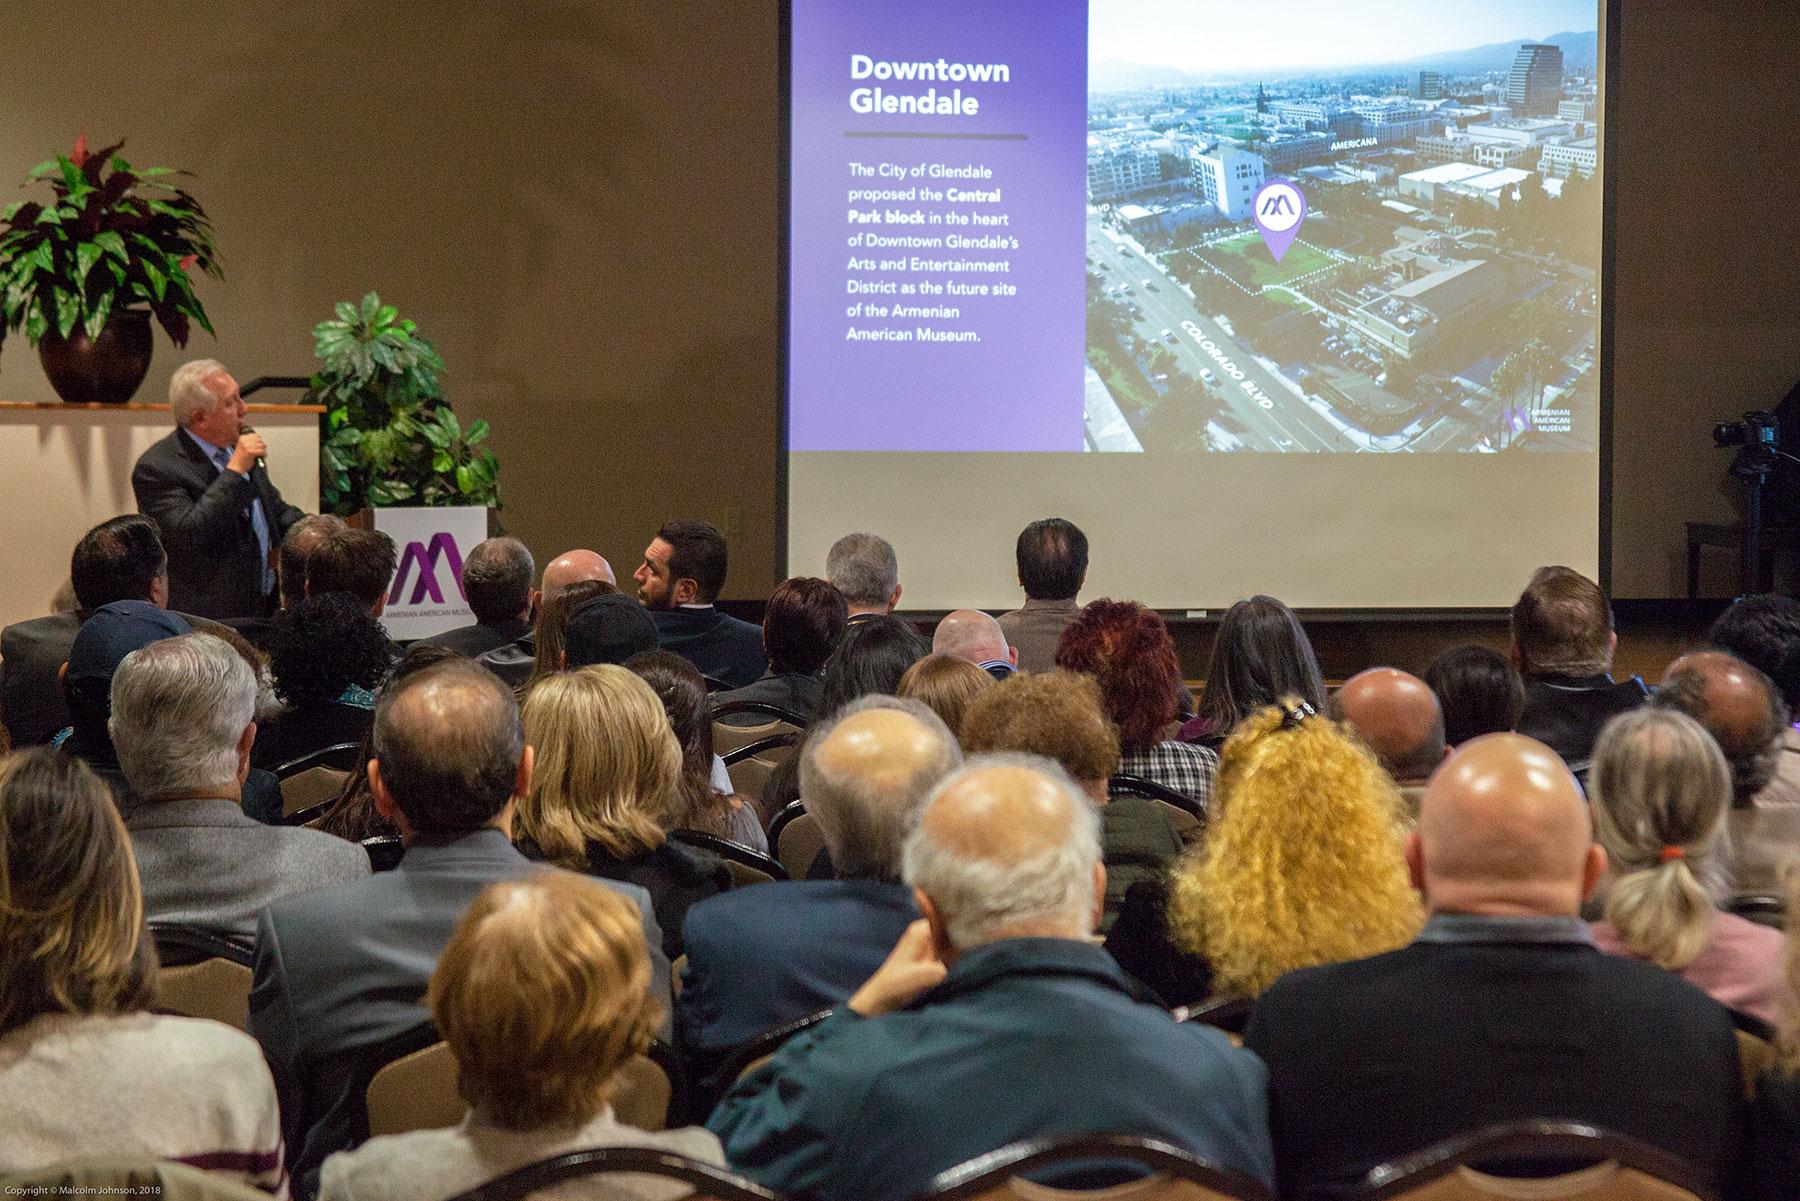 Armenian American Museum Executive Committee Chairman Berdj Karapetian Presents Downtown Glendale Location